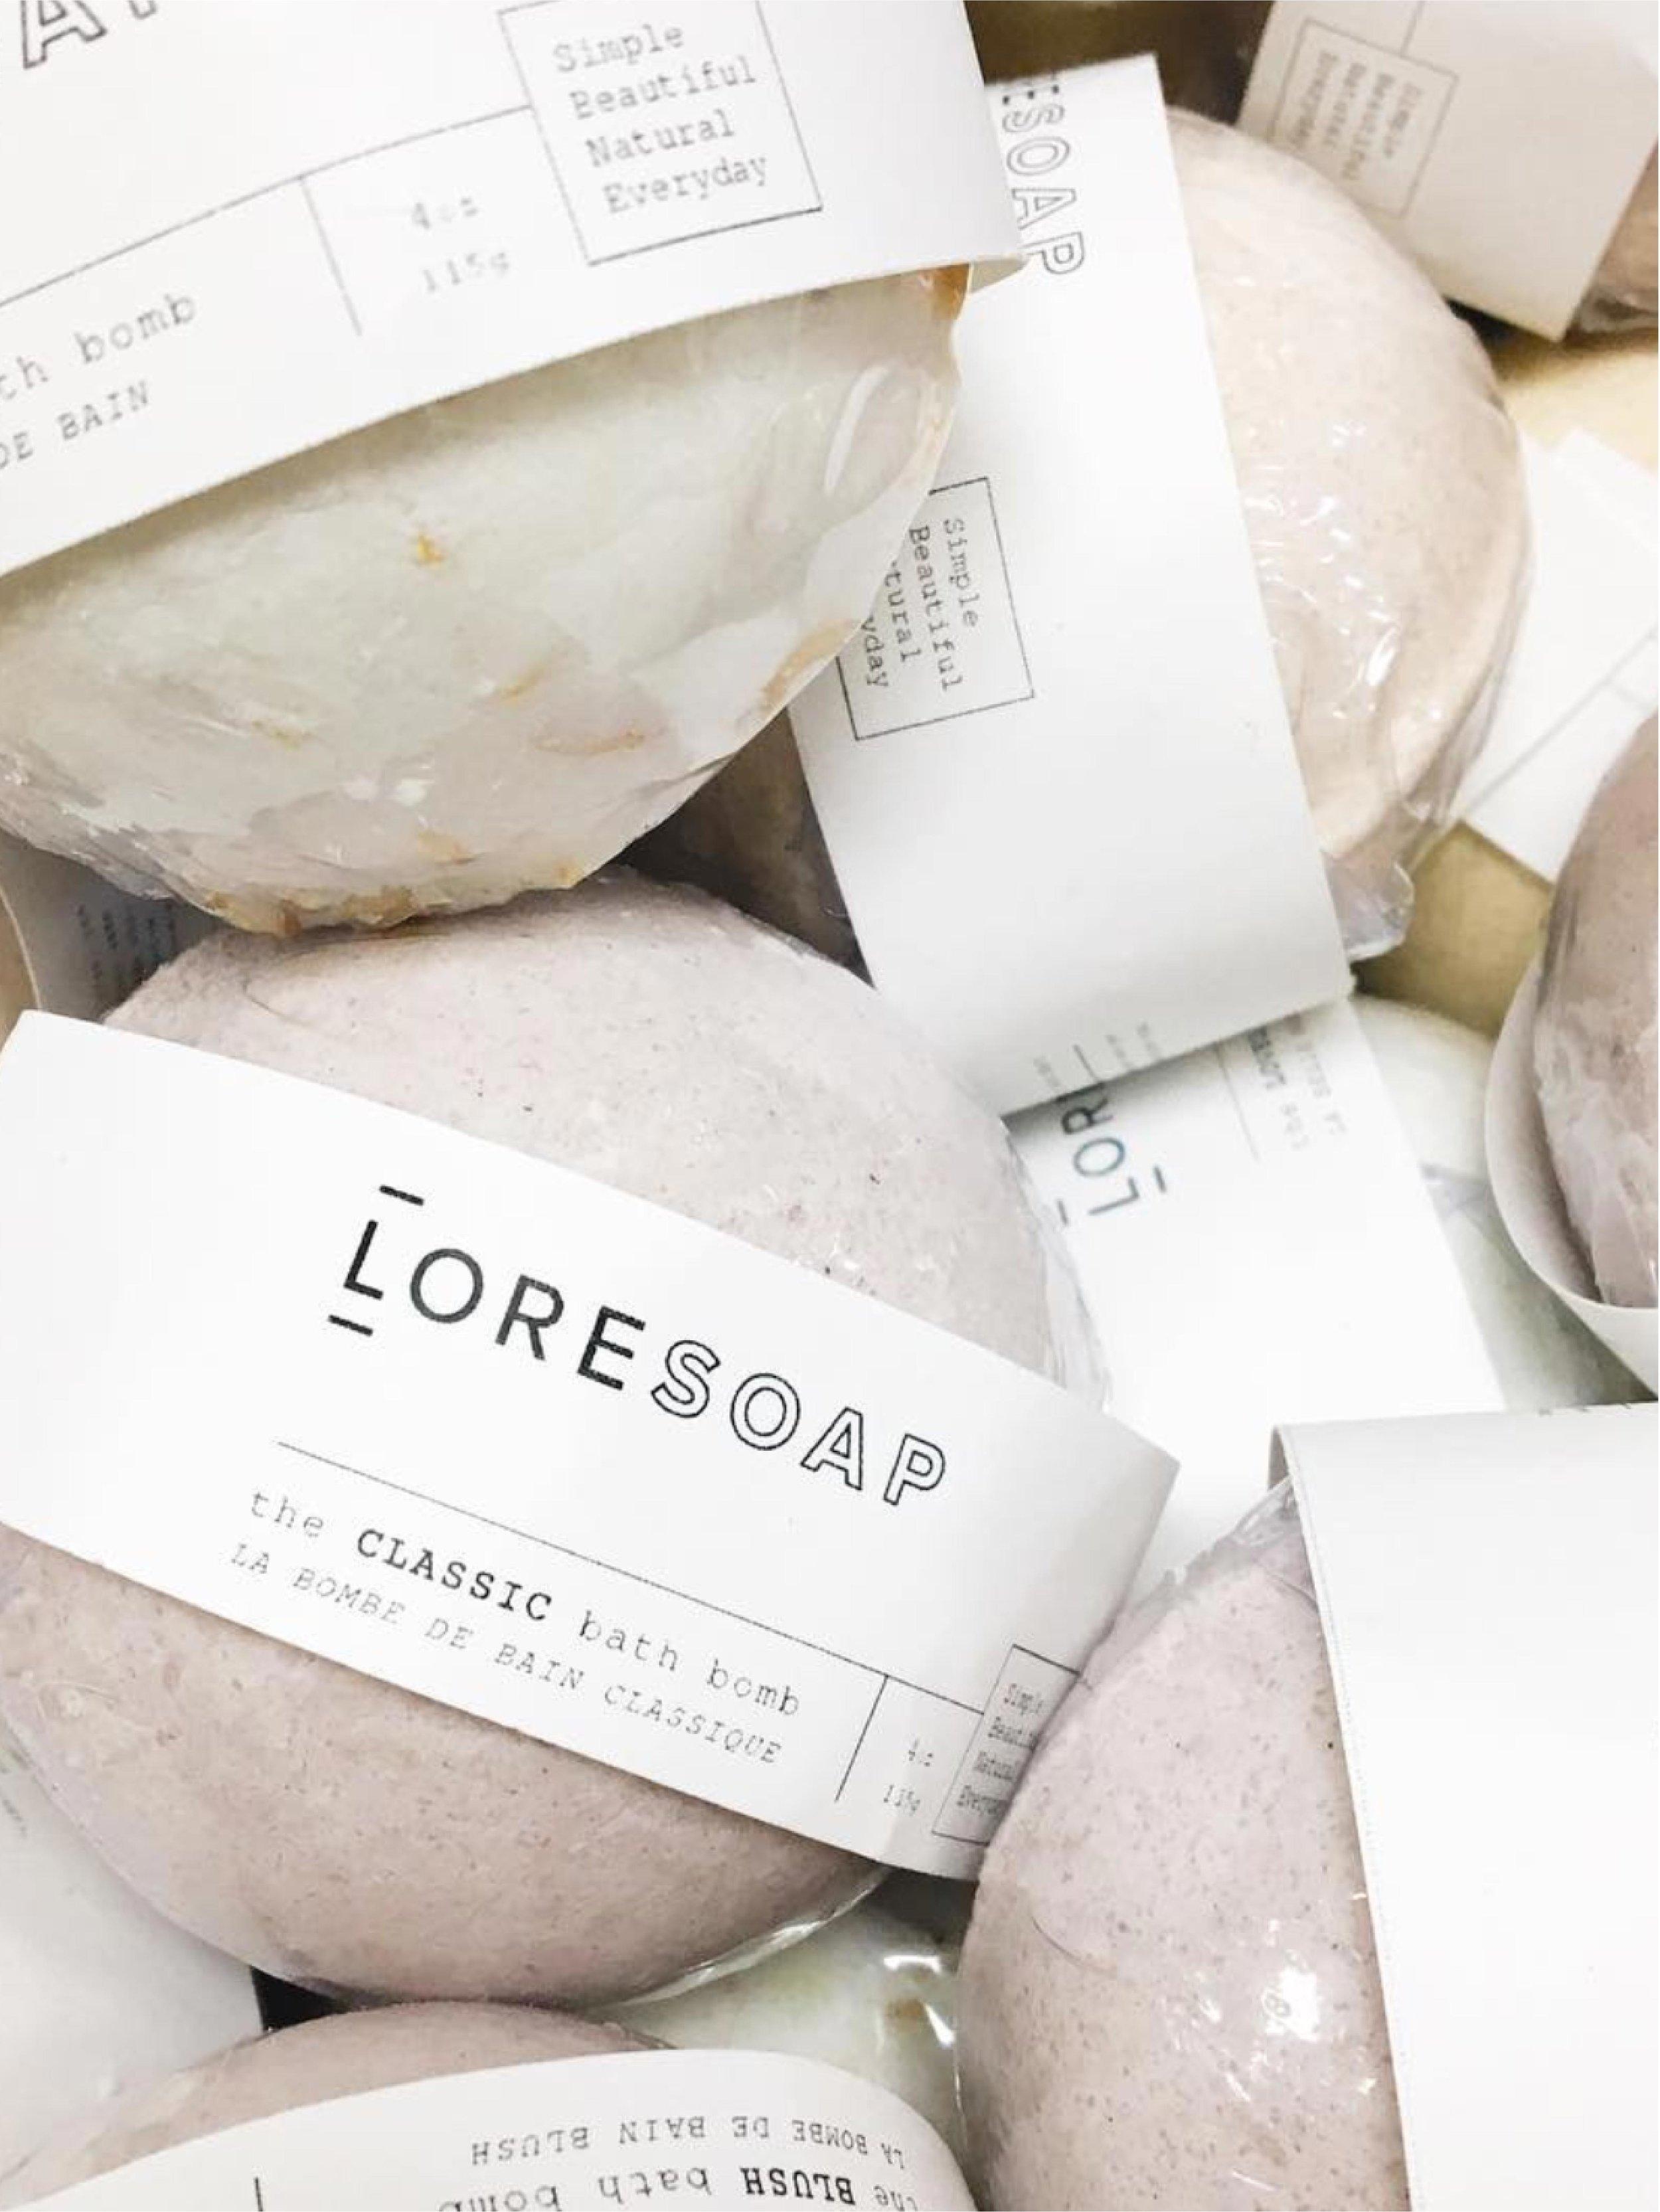 swell-yyc-lore-soap-branding-portfolio-02.jpg